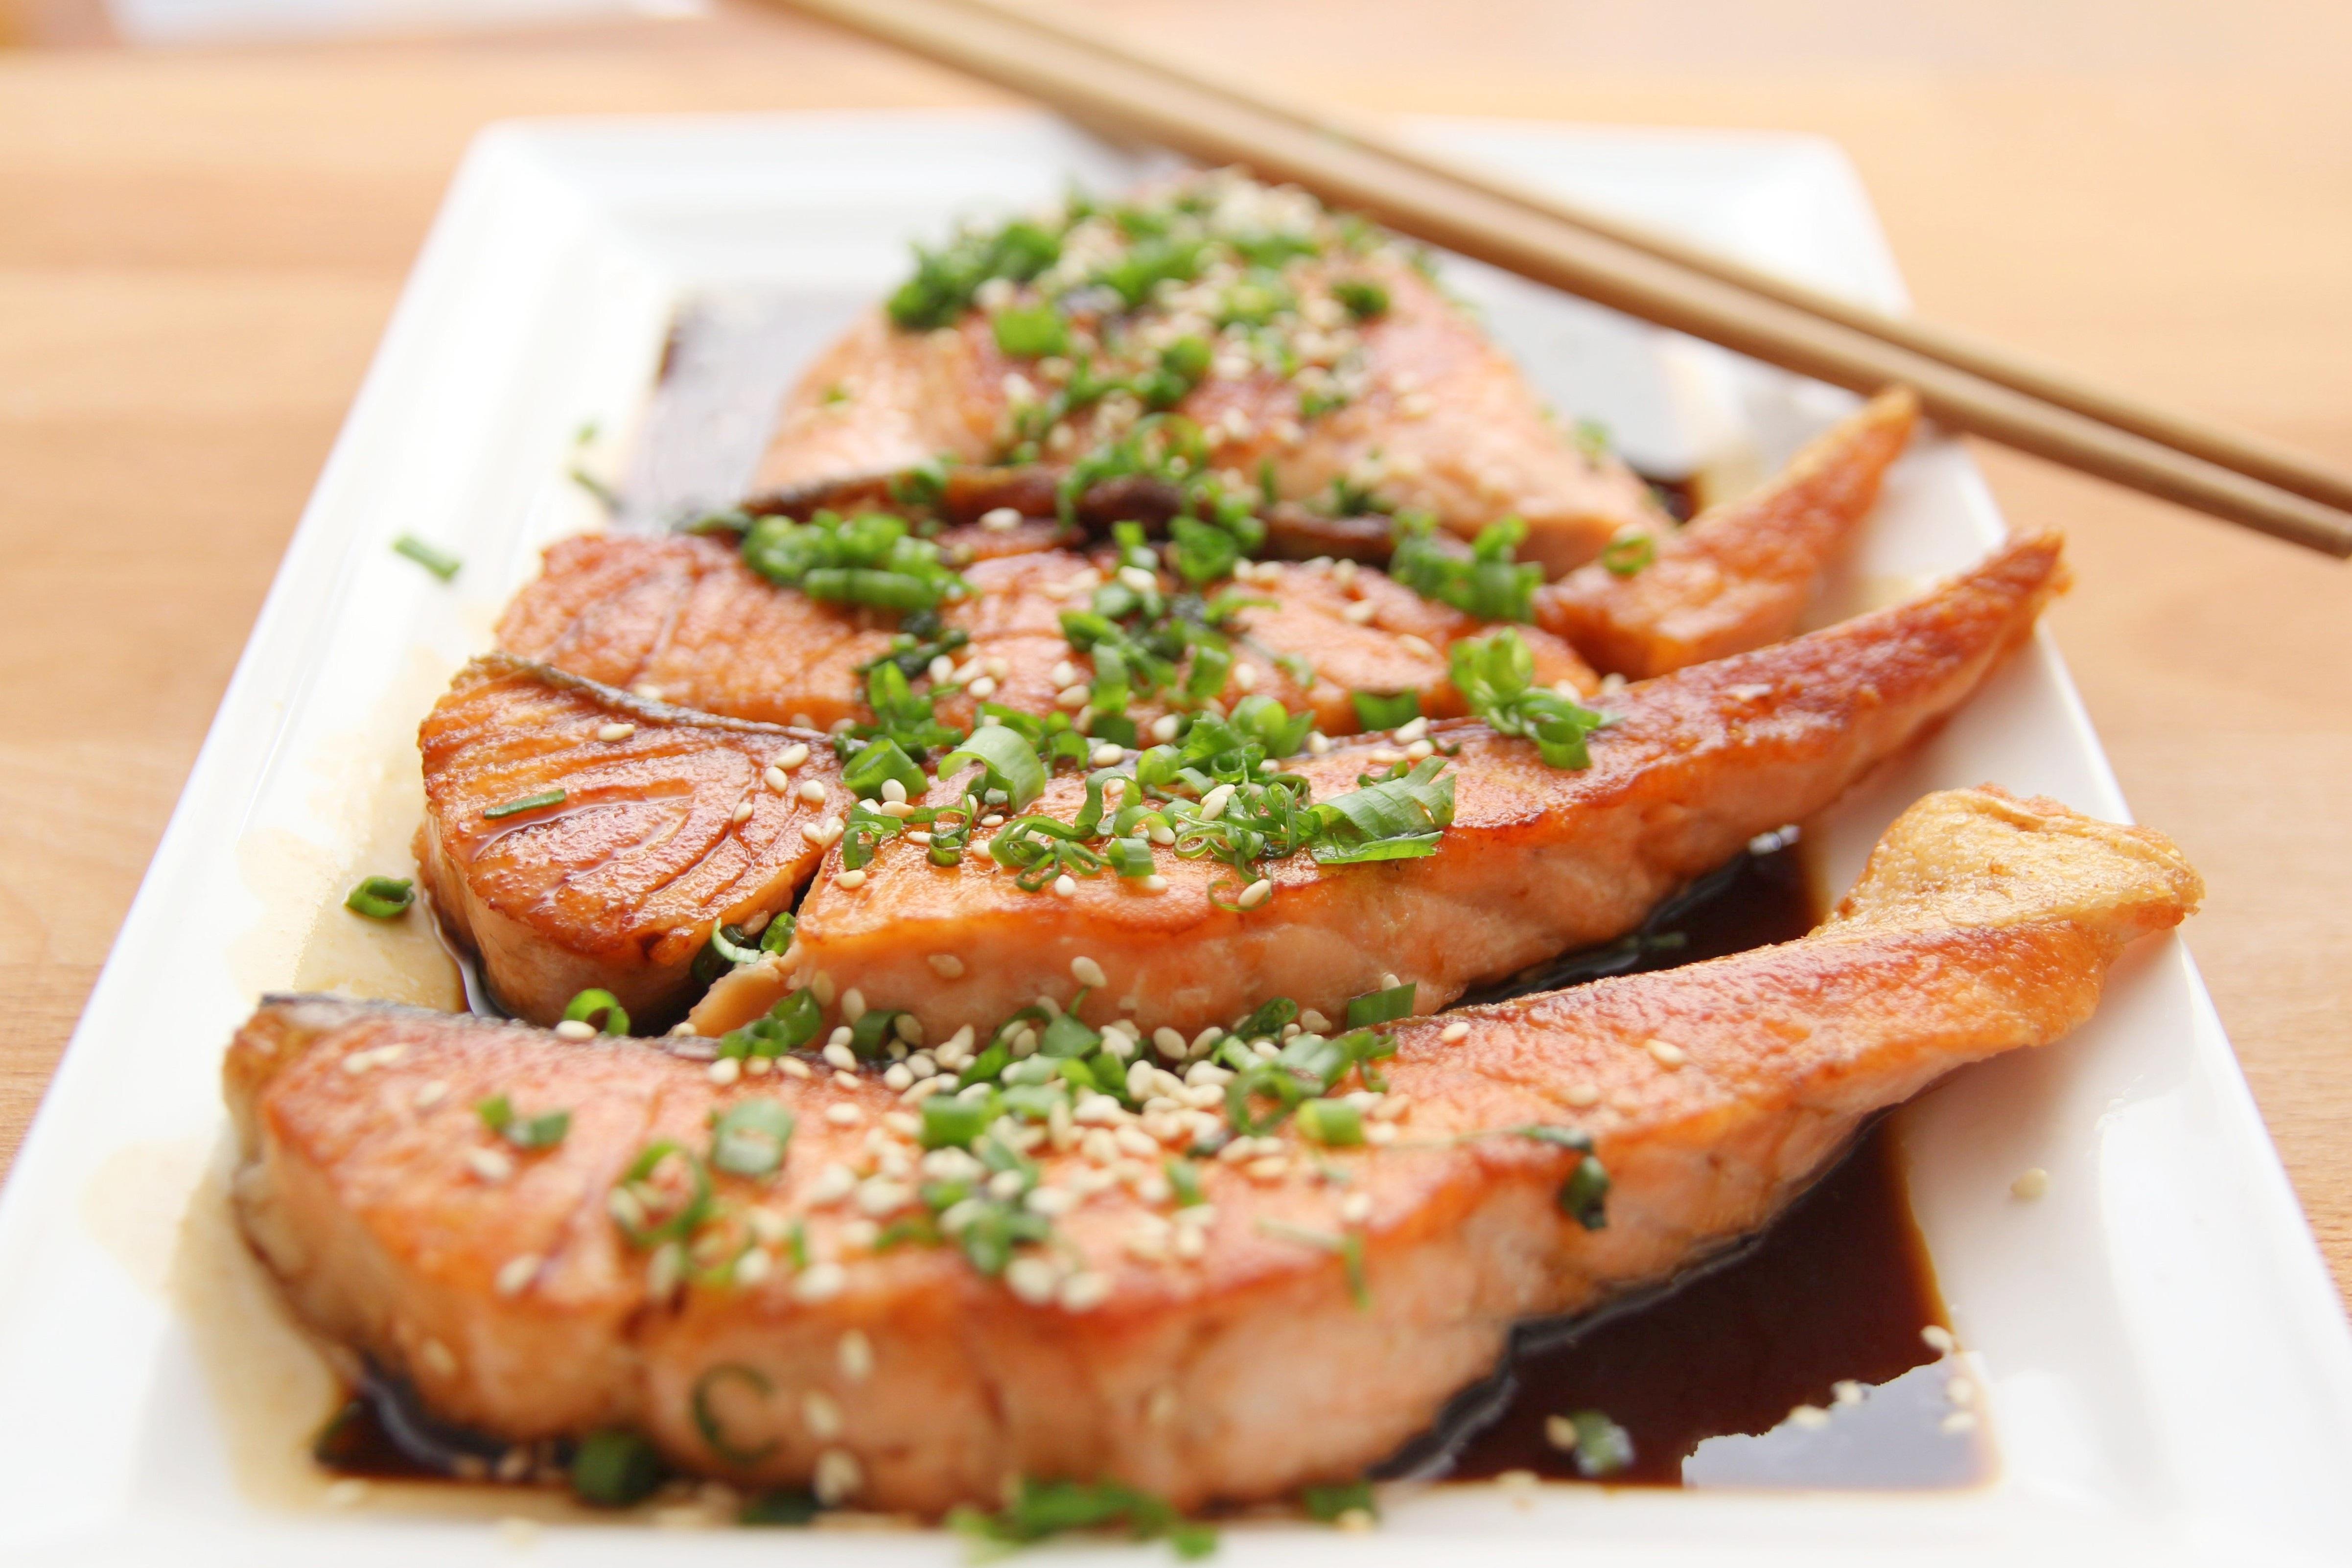 https://images.pexels.com/photos/36768/food-salmon-teriyaki-cooking.jpg